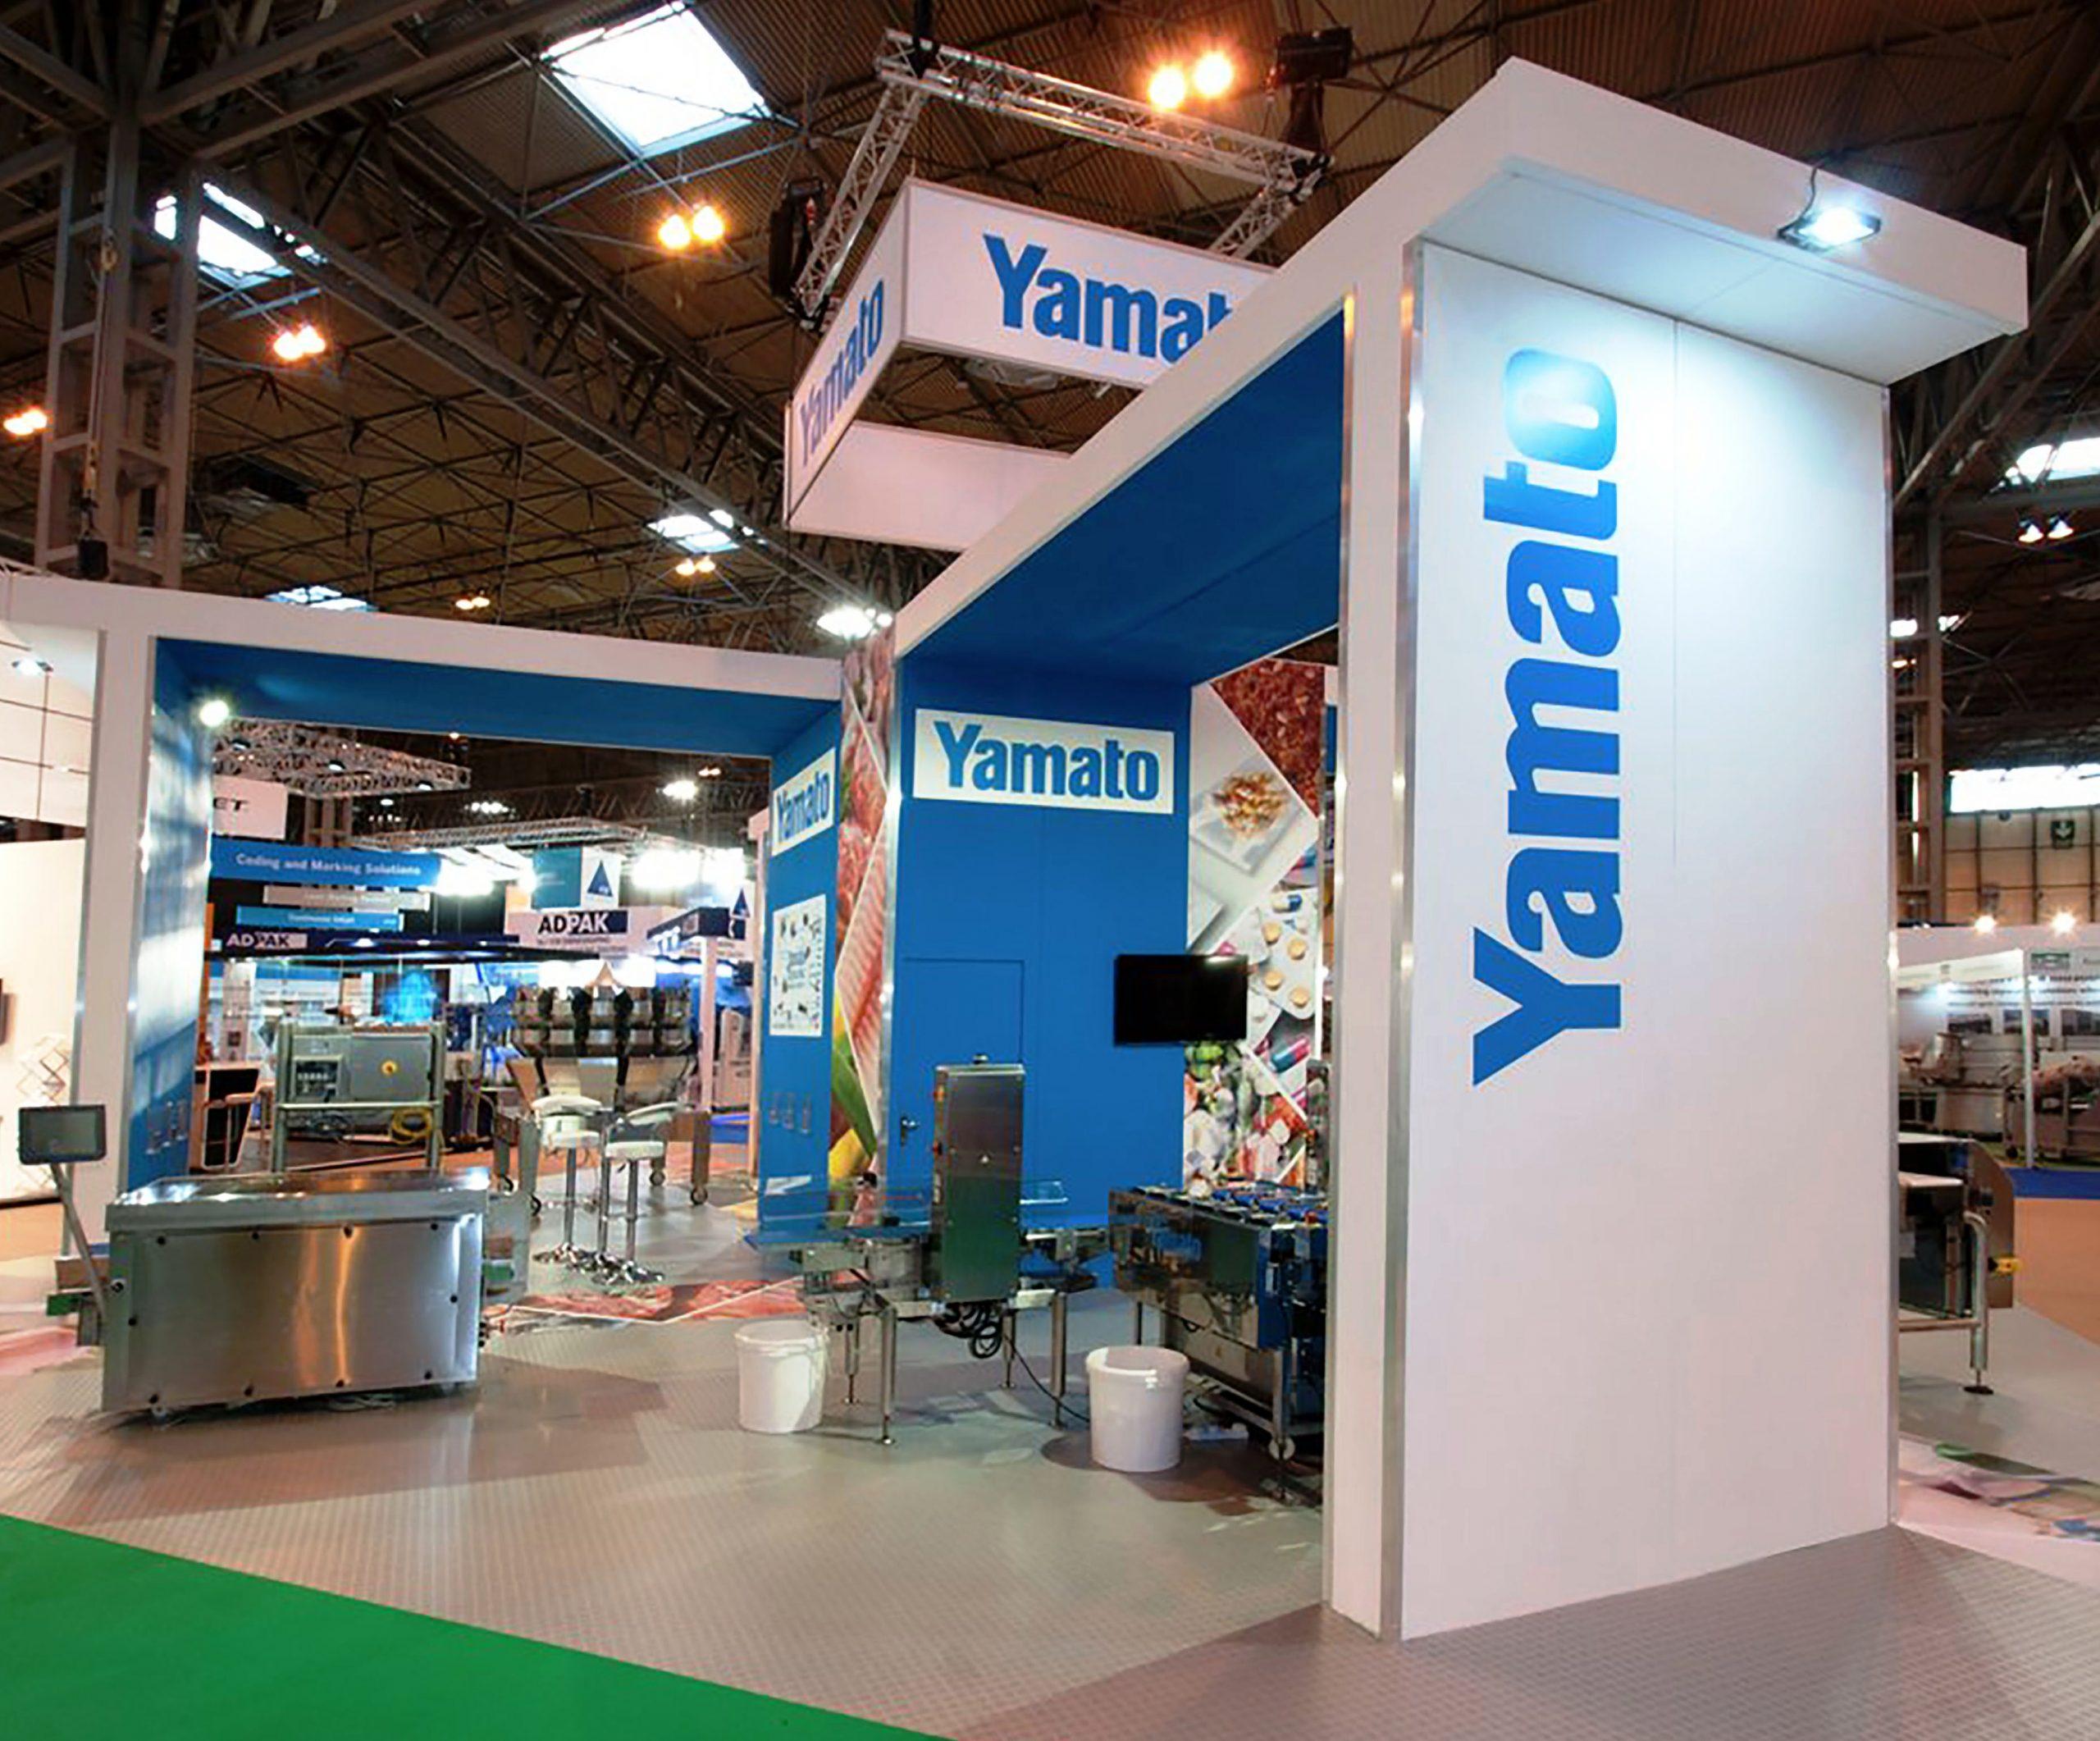 Yamato exhibiting at Foodex 2020